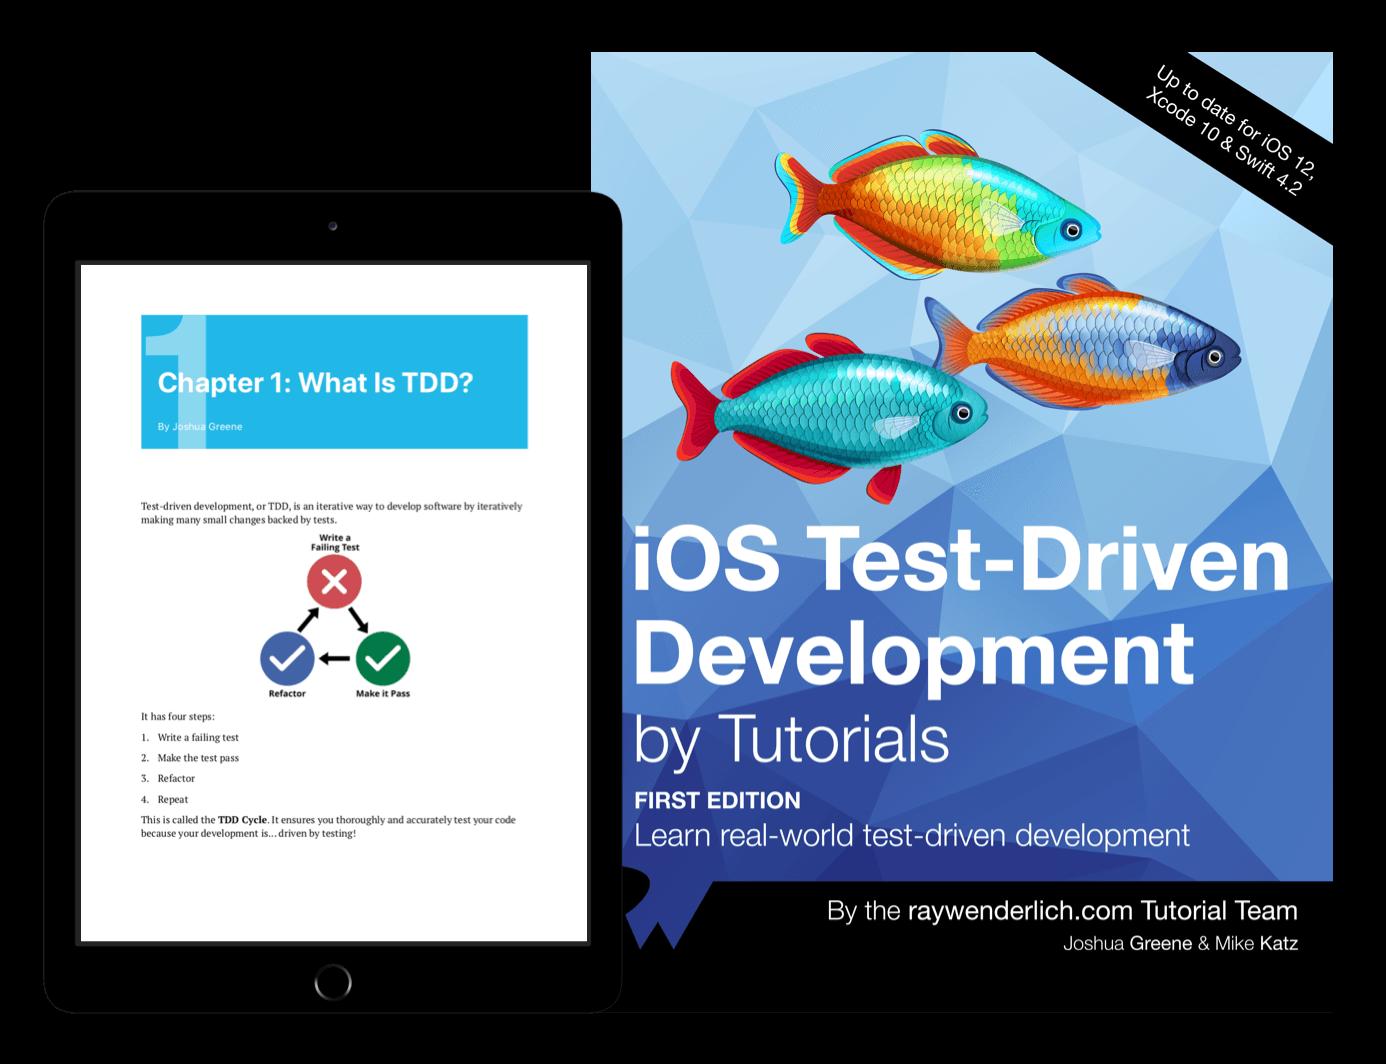 iOS Test-Driven-Development